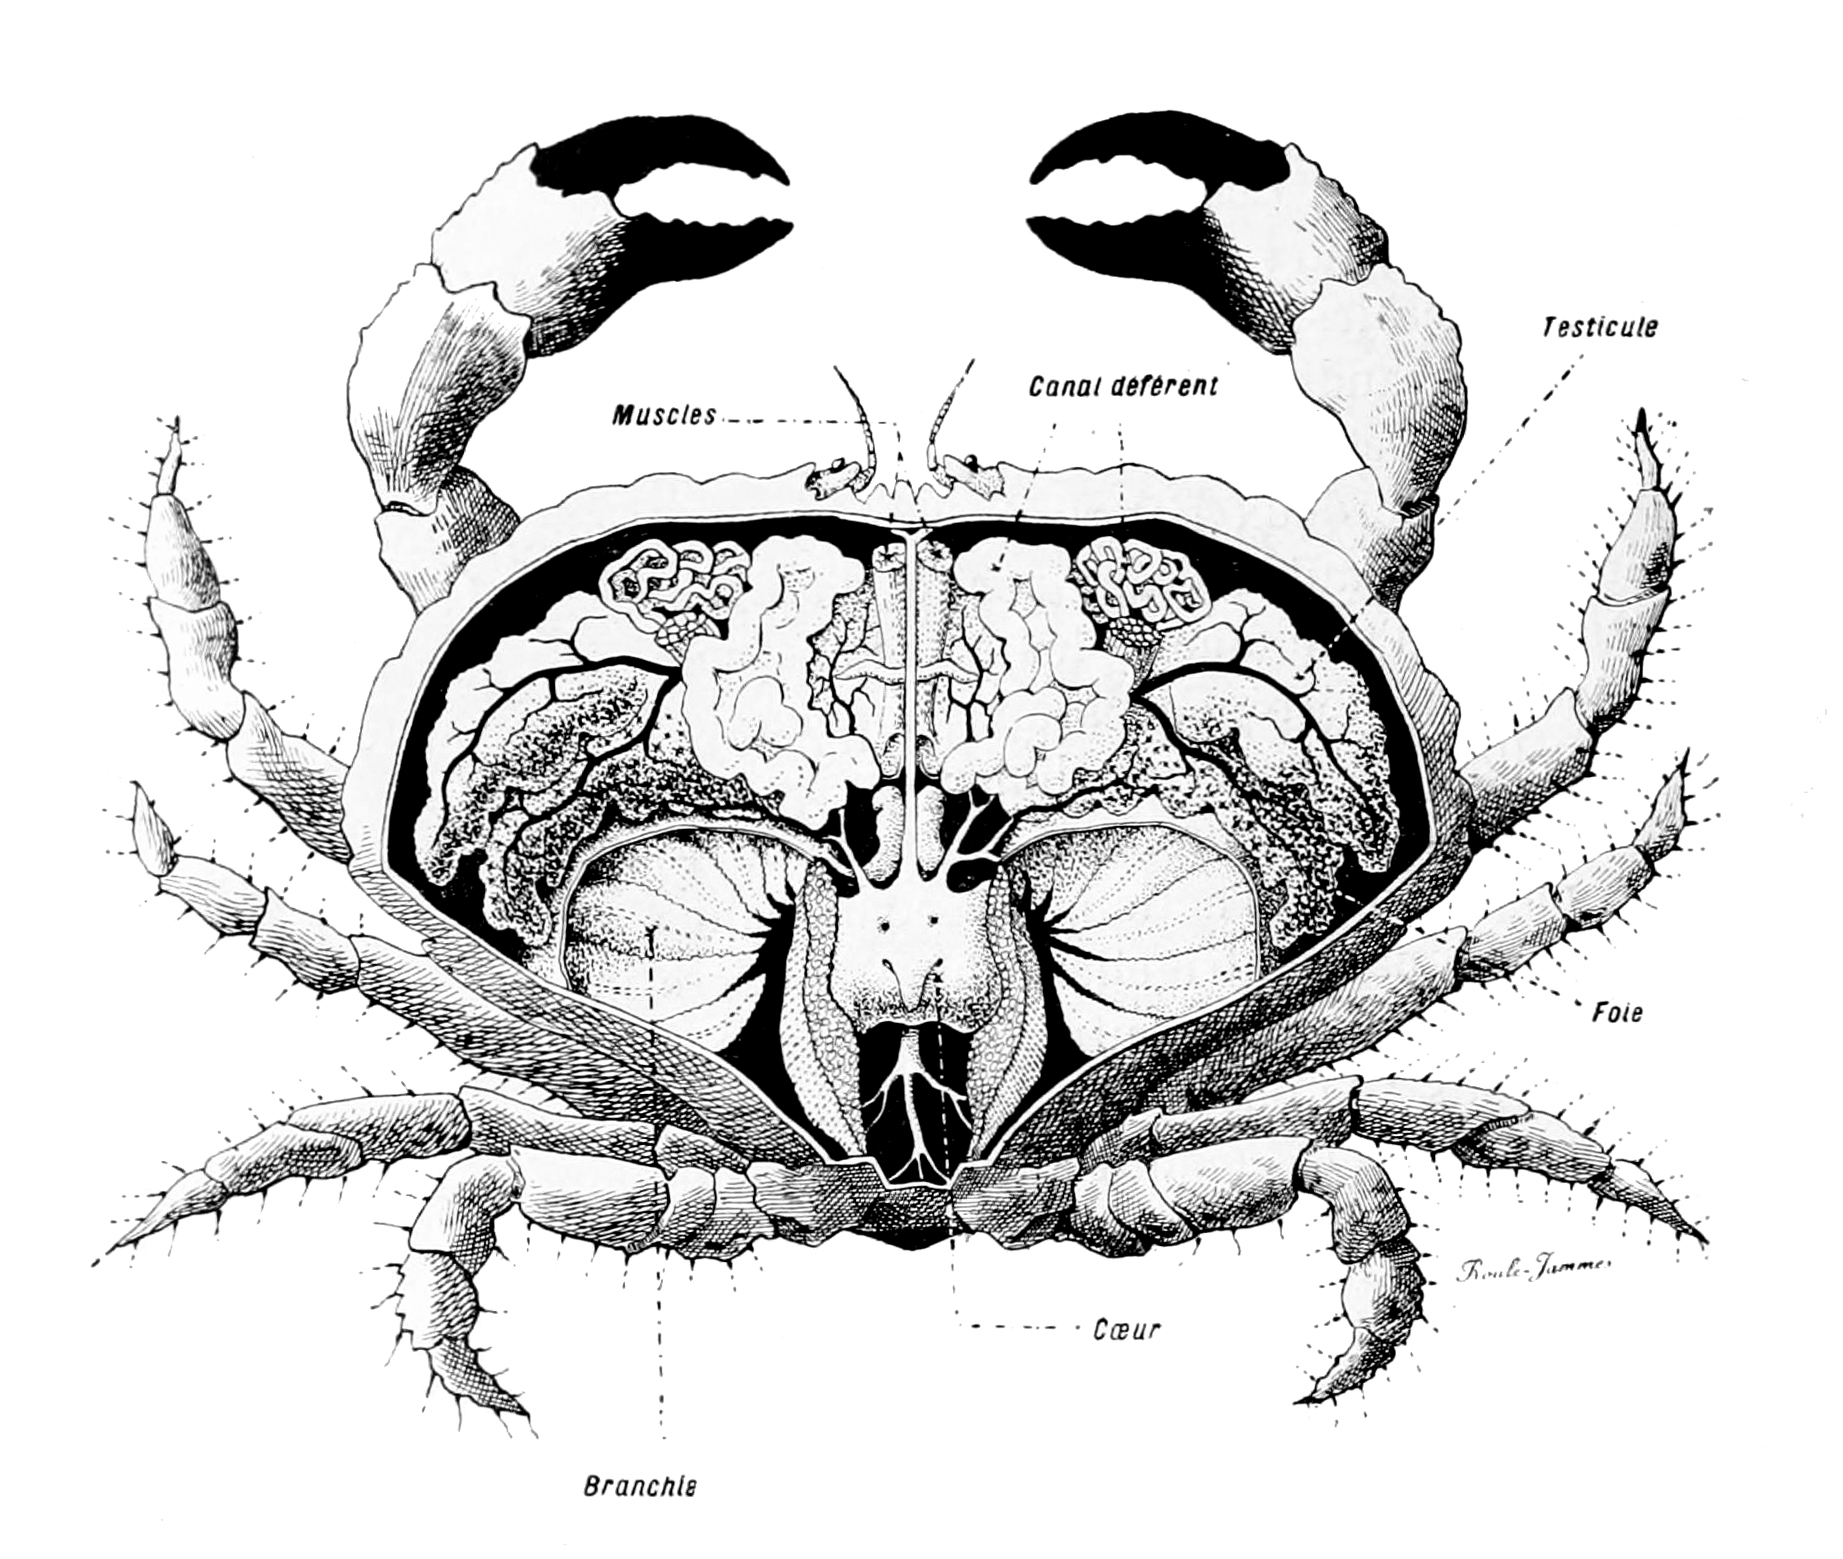 File:Crabe anatomie.jpg - Wikimedia Commons